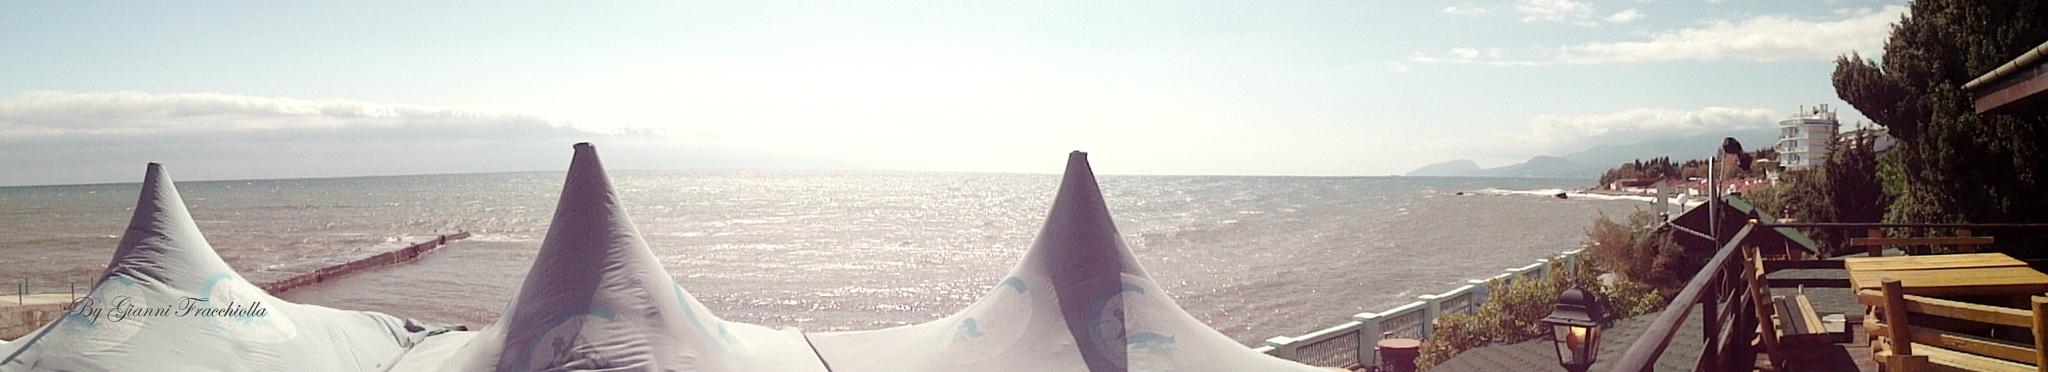 Panoramica sul Mar Nero. by jonny